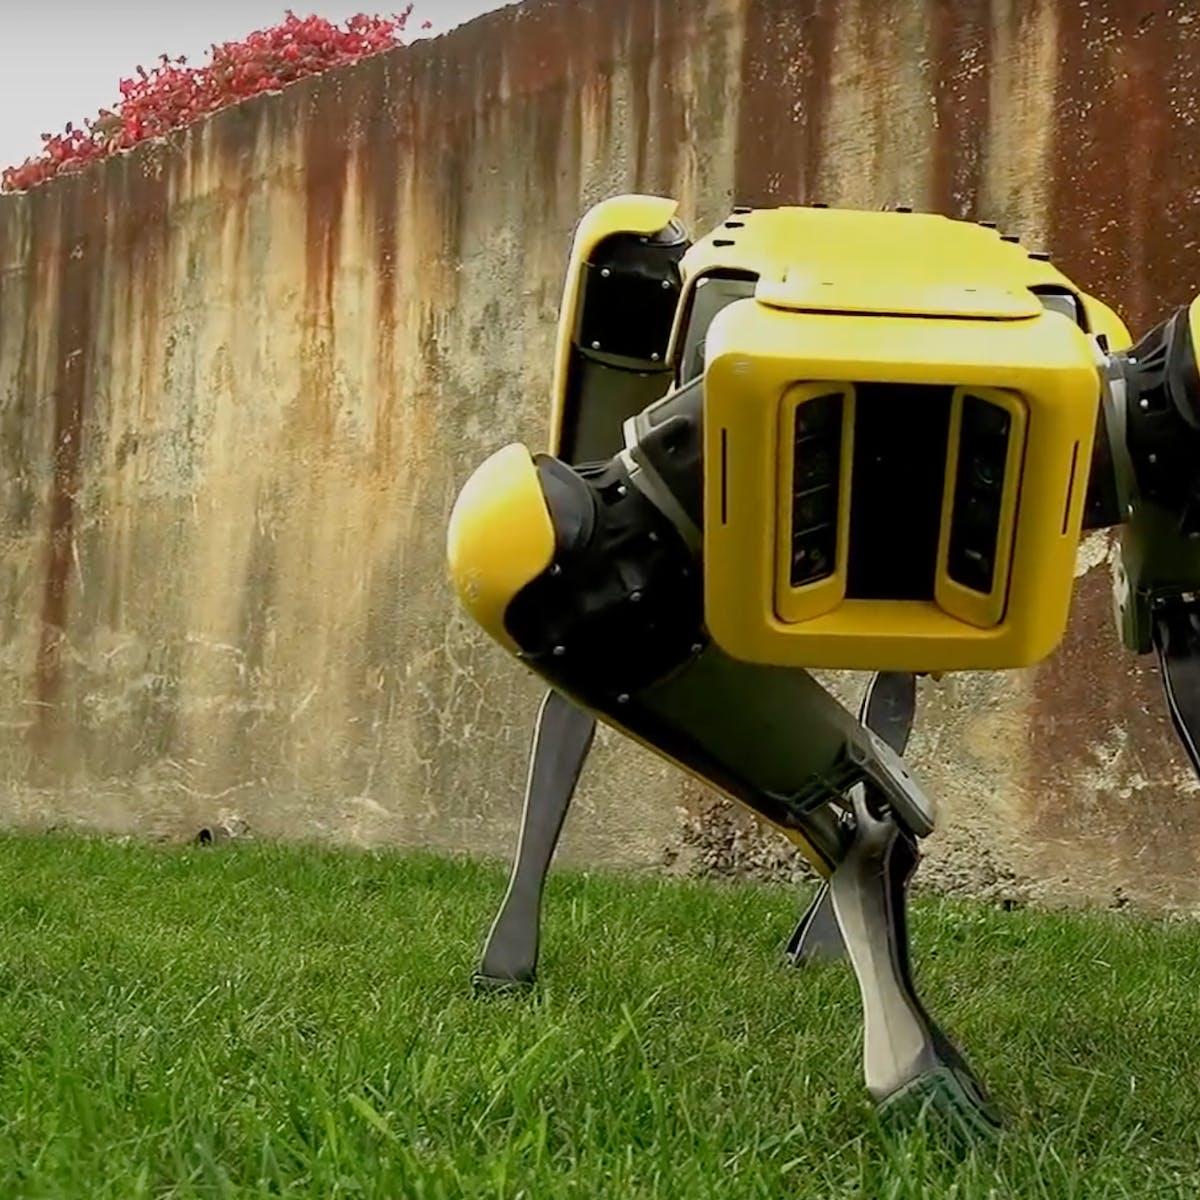 Boston Dynamics: The Latest SpotMini Is Still a Creepy Robot